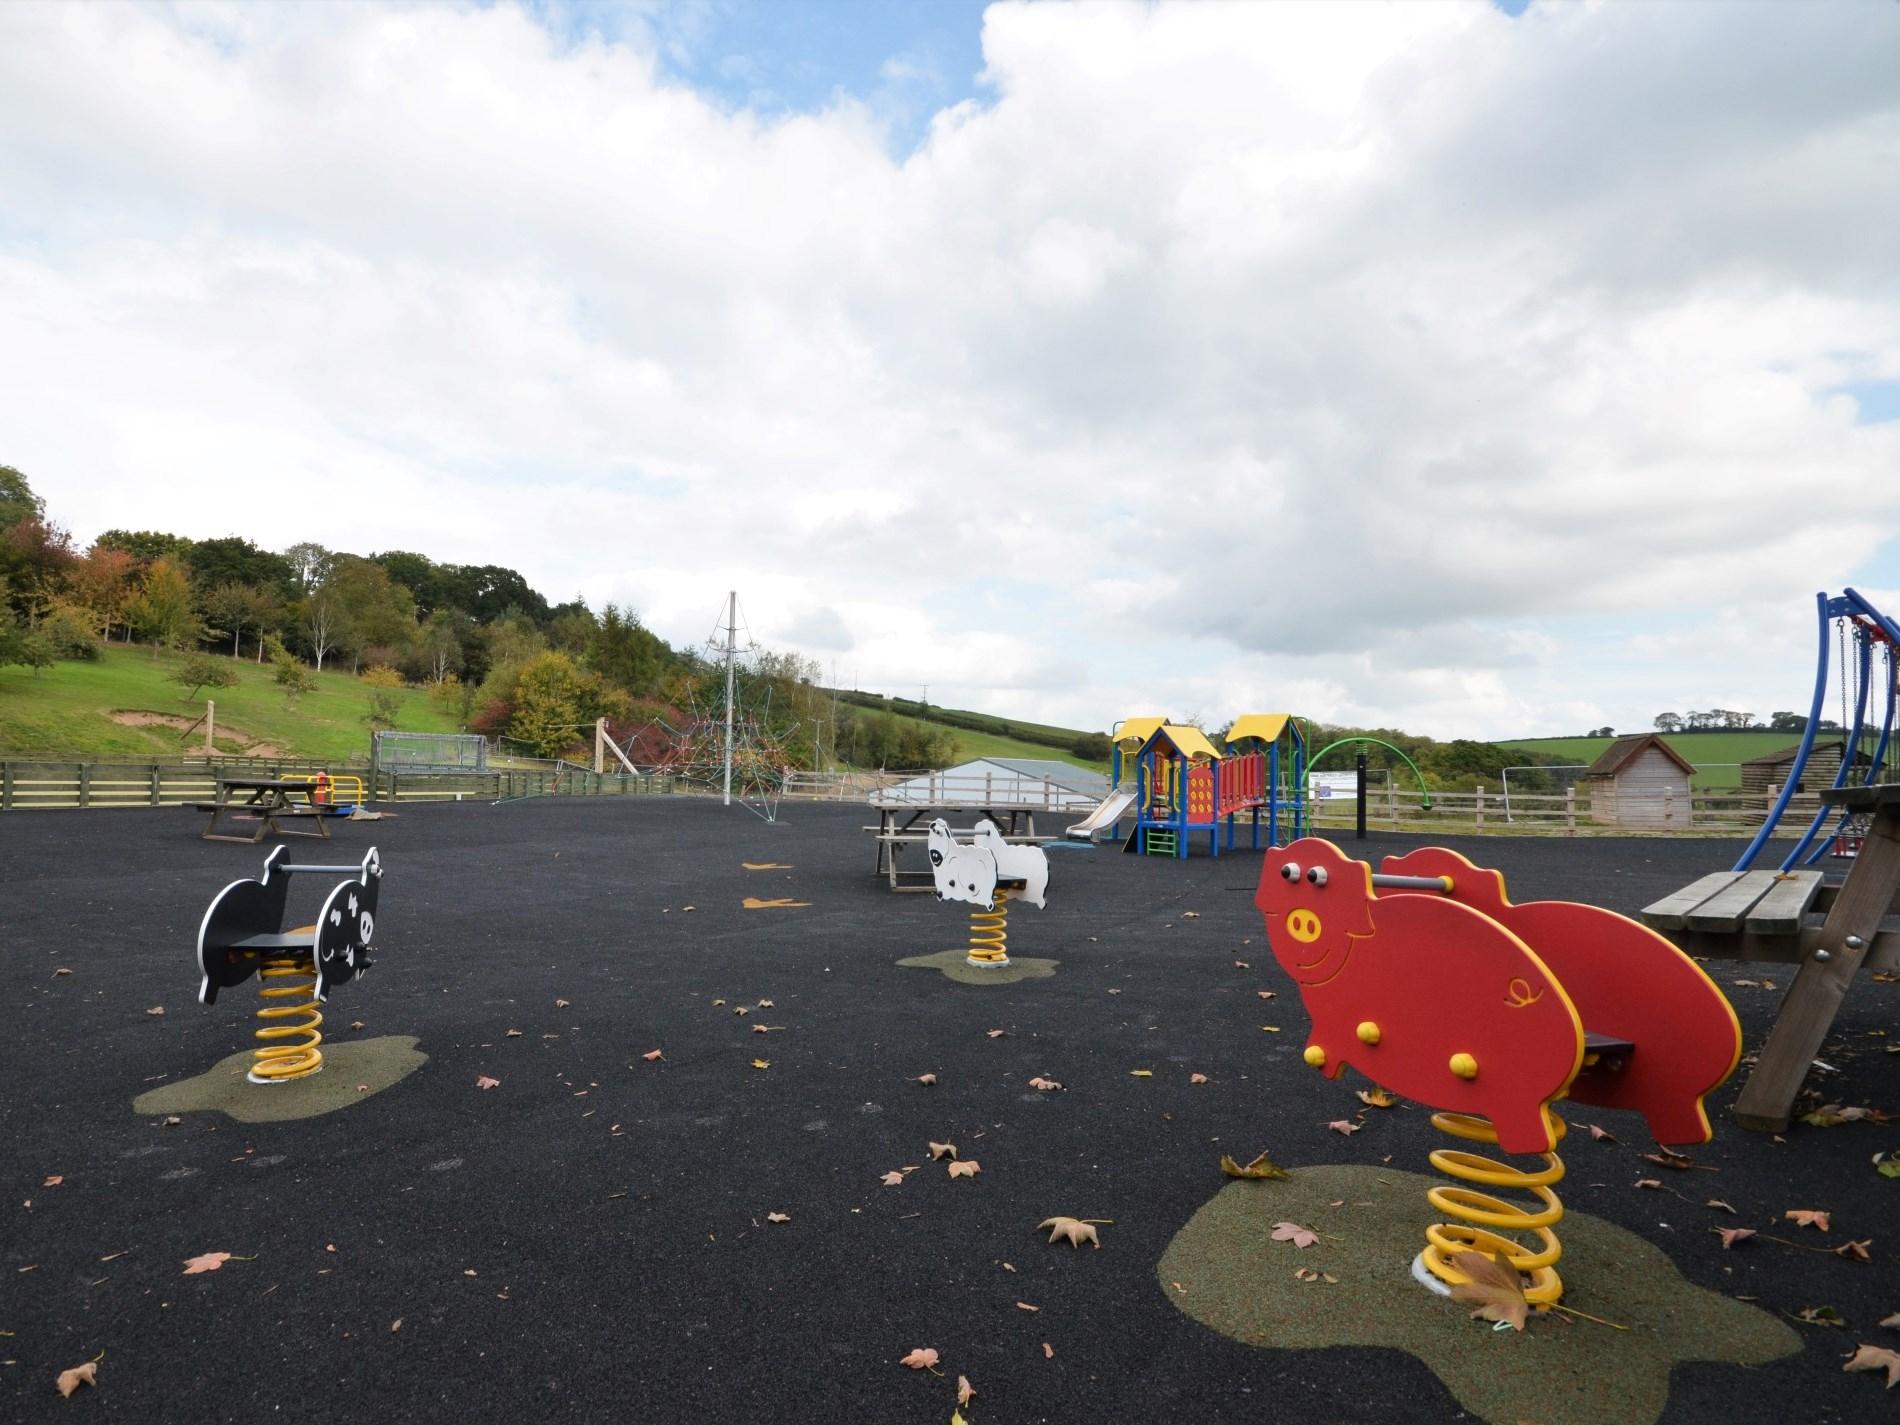 Enjoy the outside play area